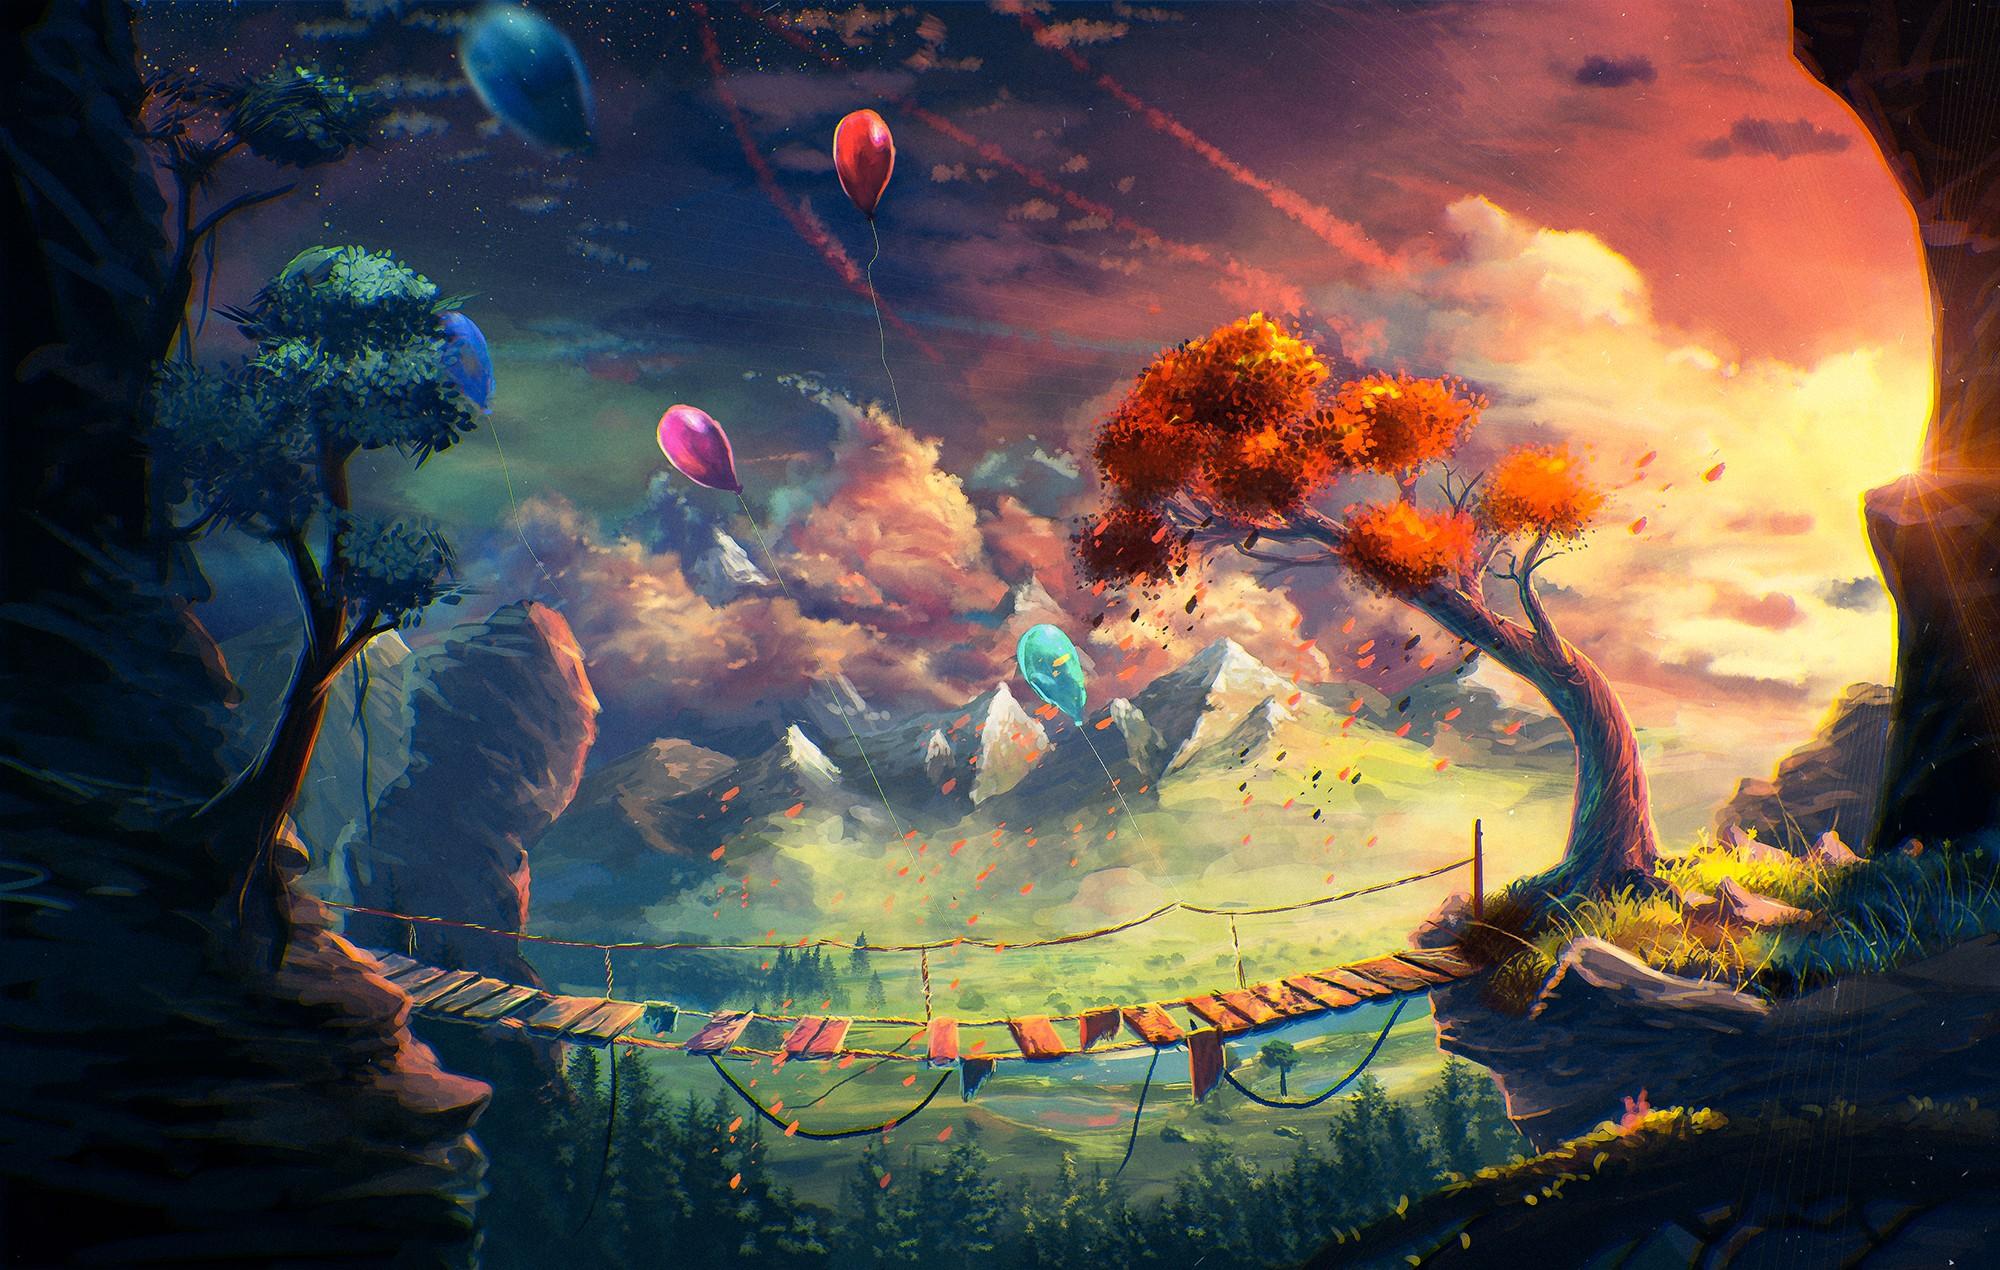 Mountains Fantasy Art Anime Artwork Clouds Bridge Balloon Sylar Screenshot Computer Wallpaper